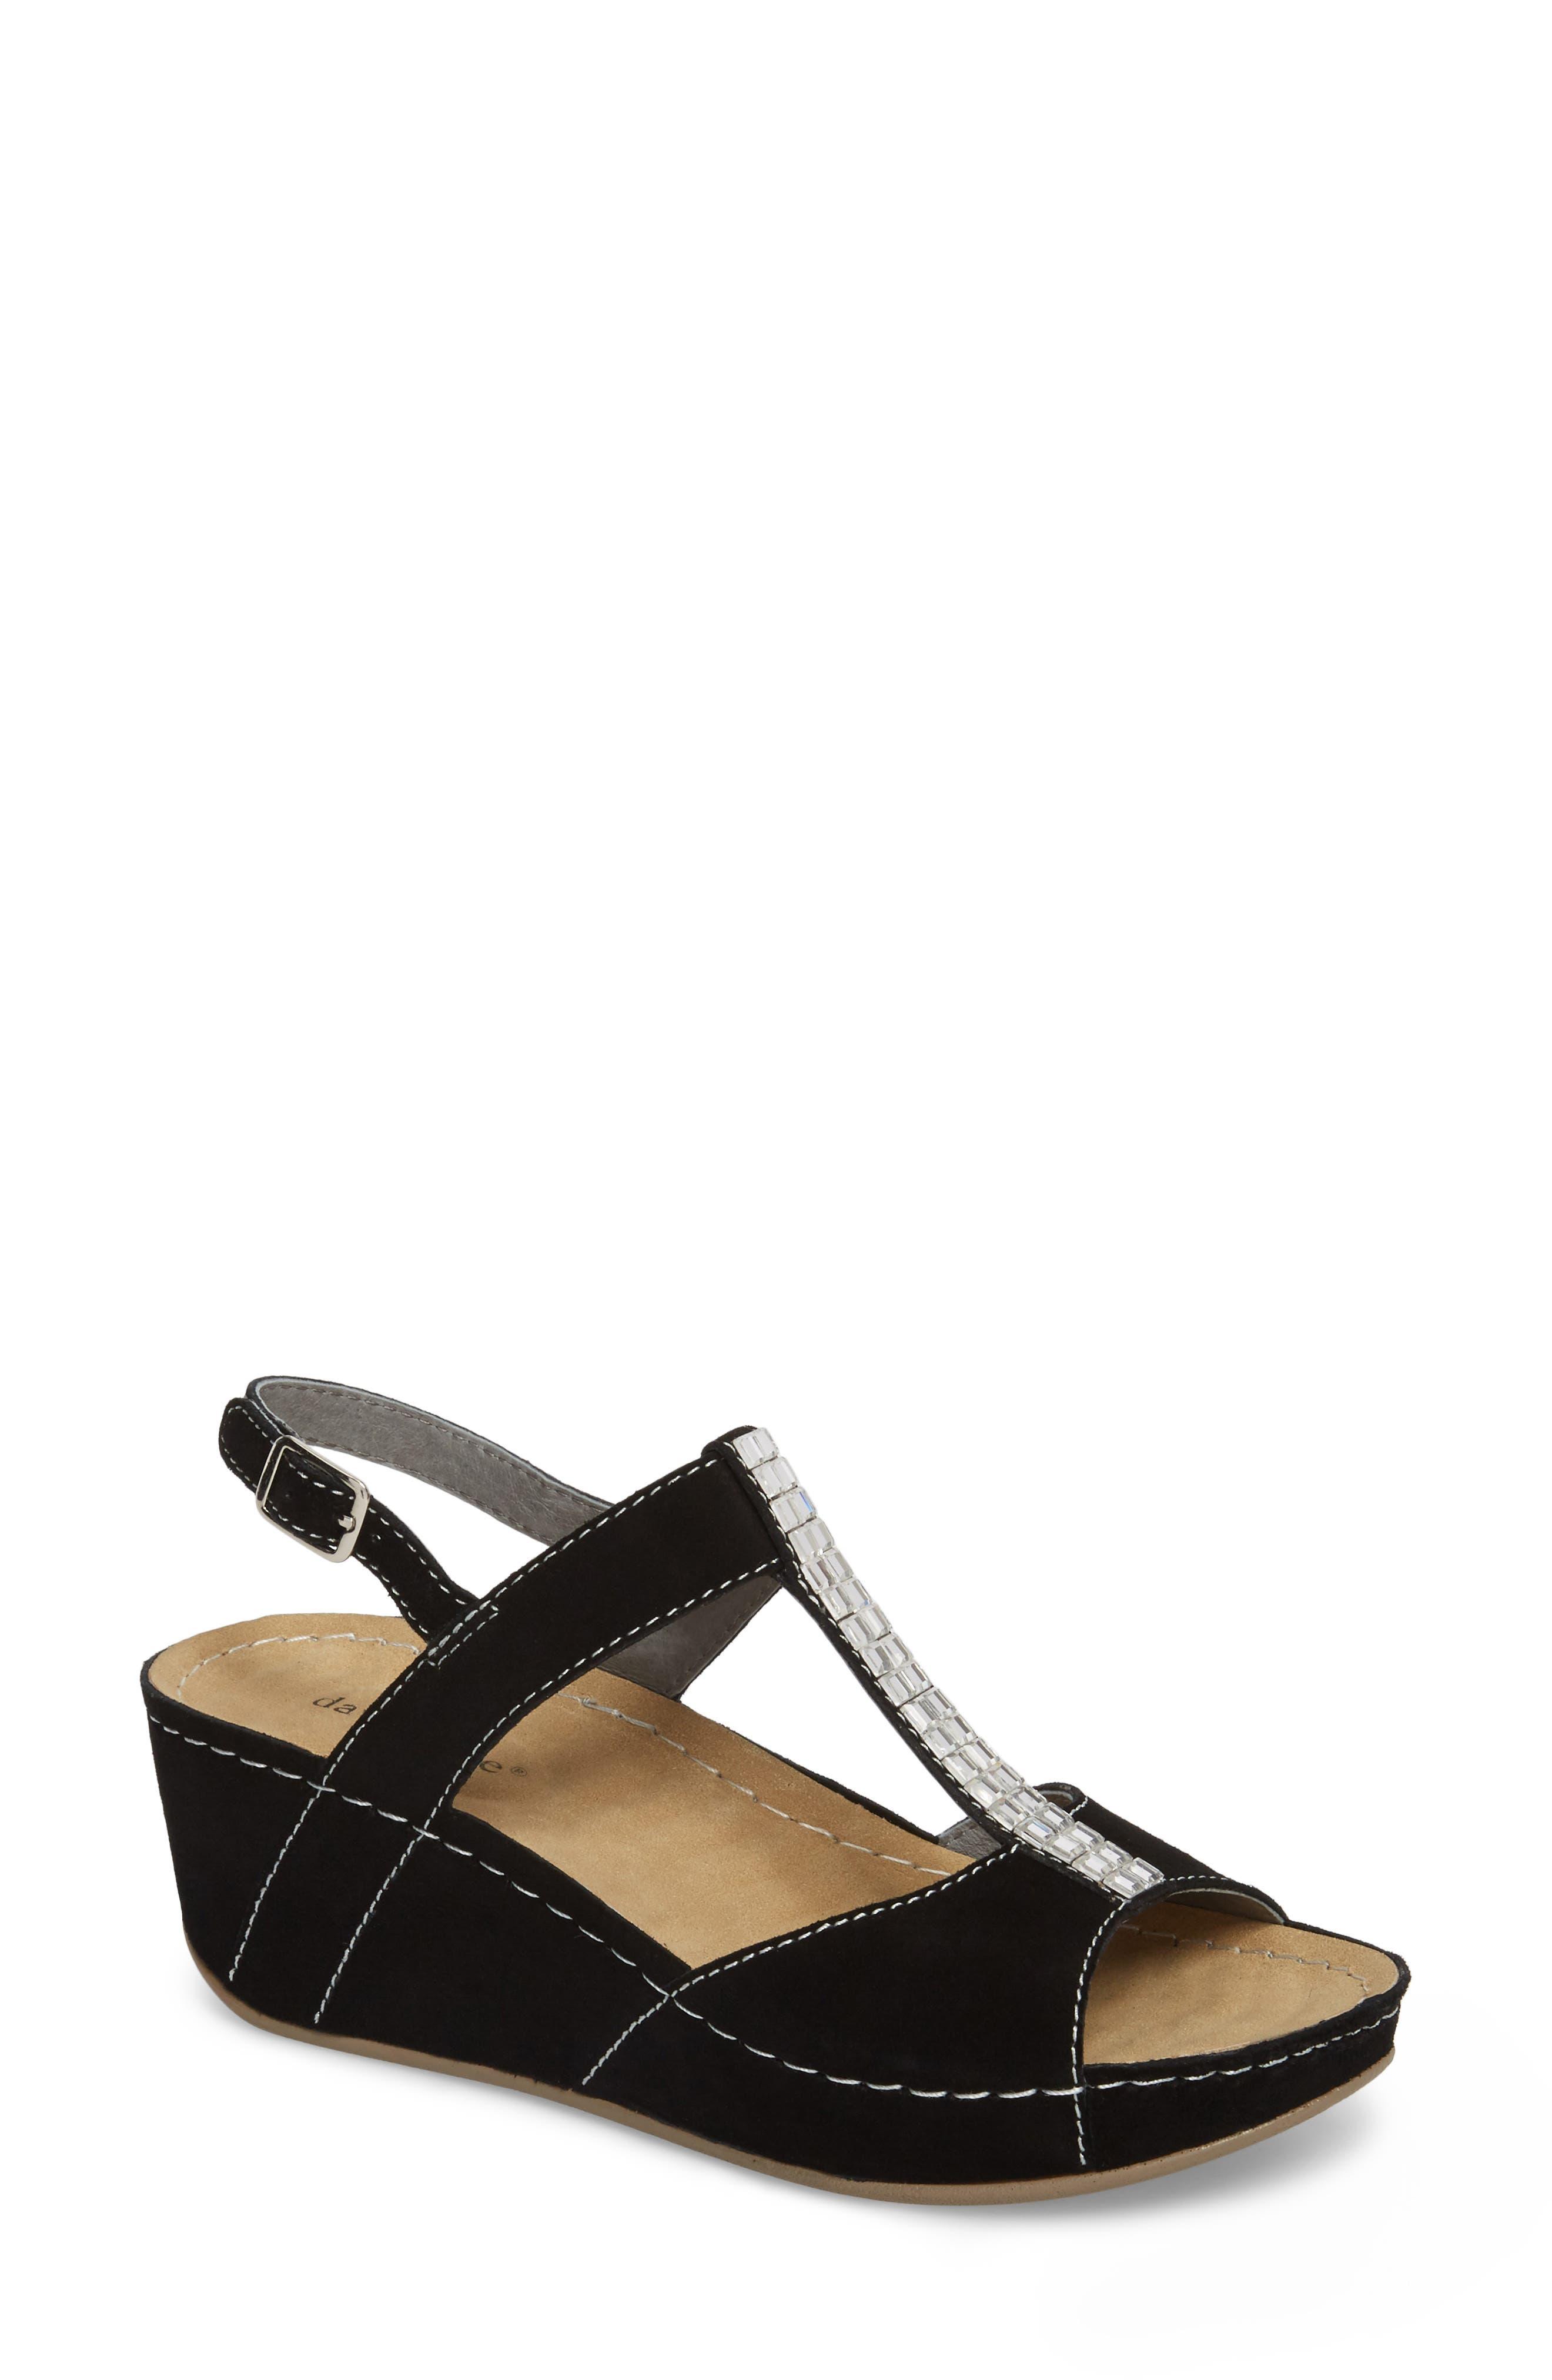 Bubbly Embellished T-Strap Wedge Sandal,                         Main,                         color, BLACK SUEDE